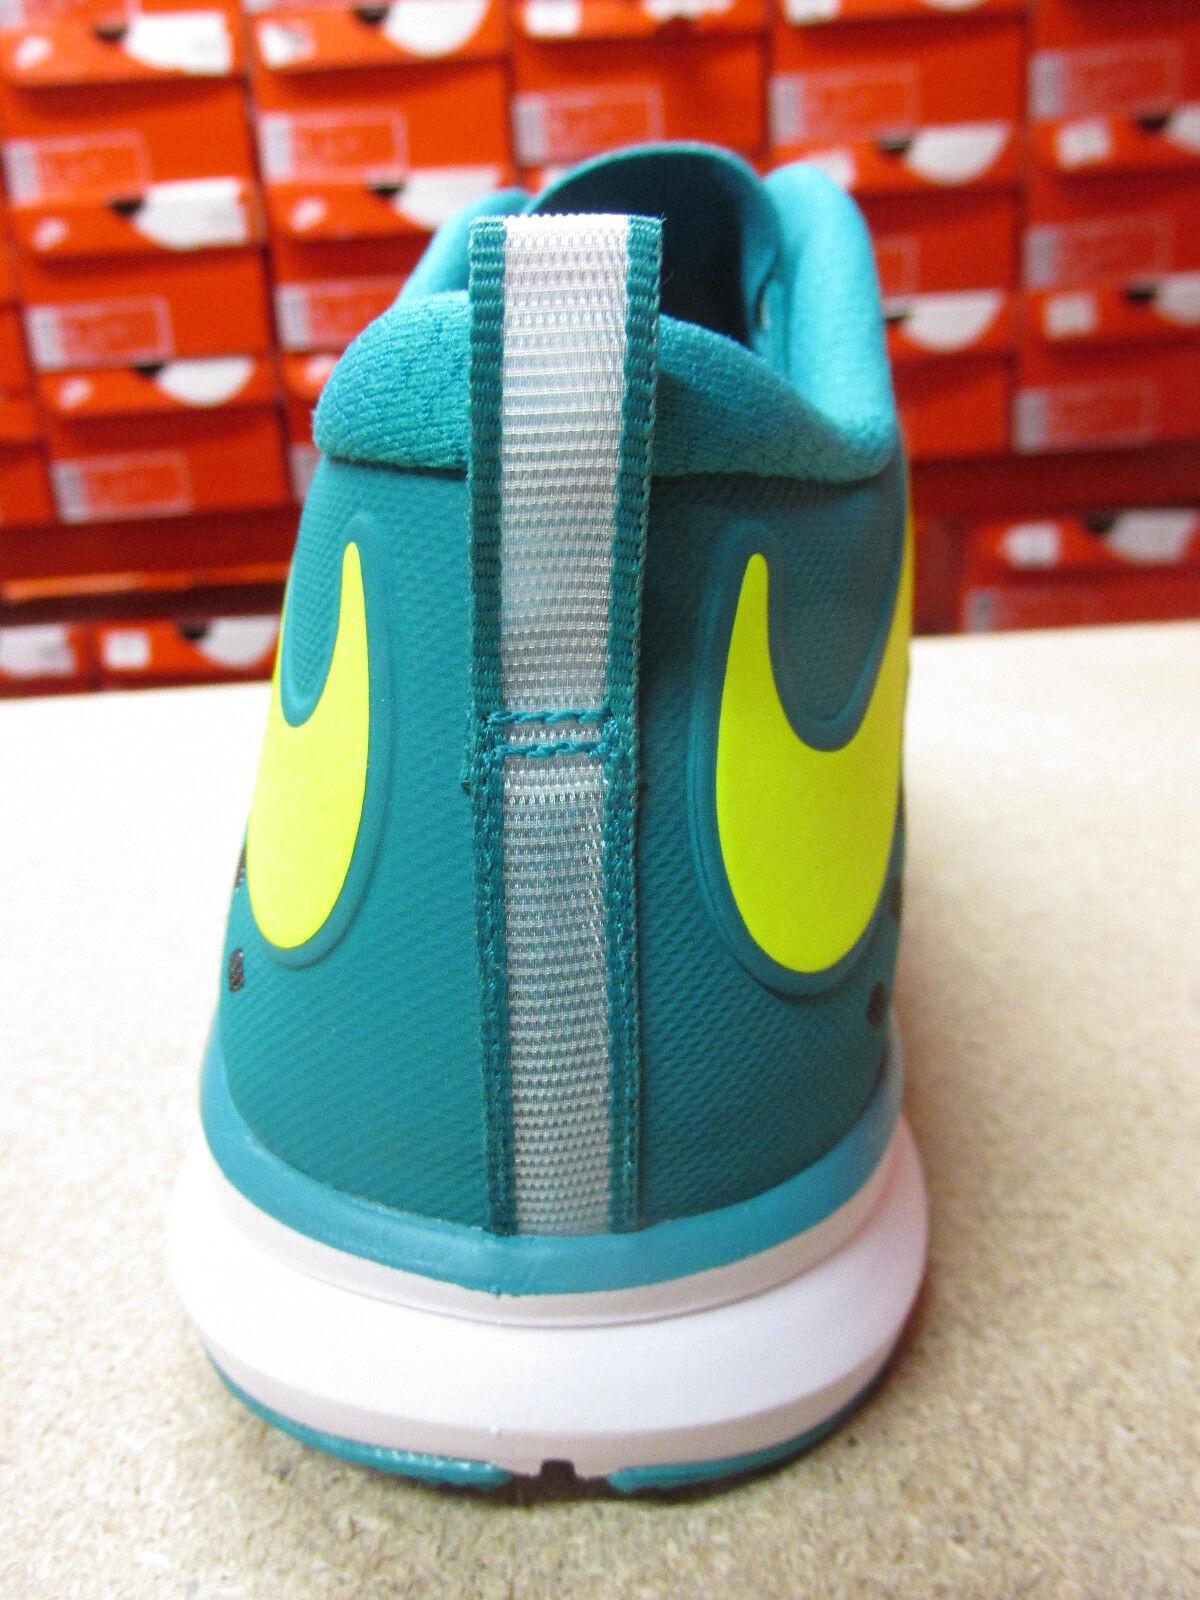 Nike Train fonctionnement Quick homme fonctionnement Train Trainers 844406 370 Sneakers chaussures 0c250a